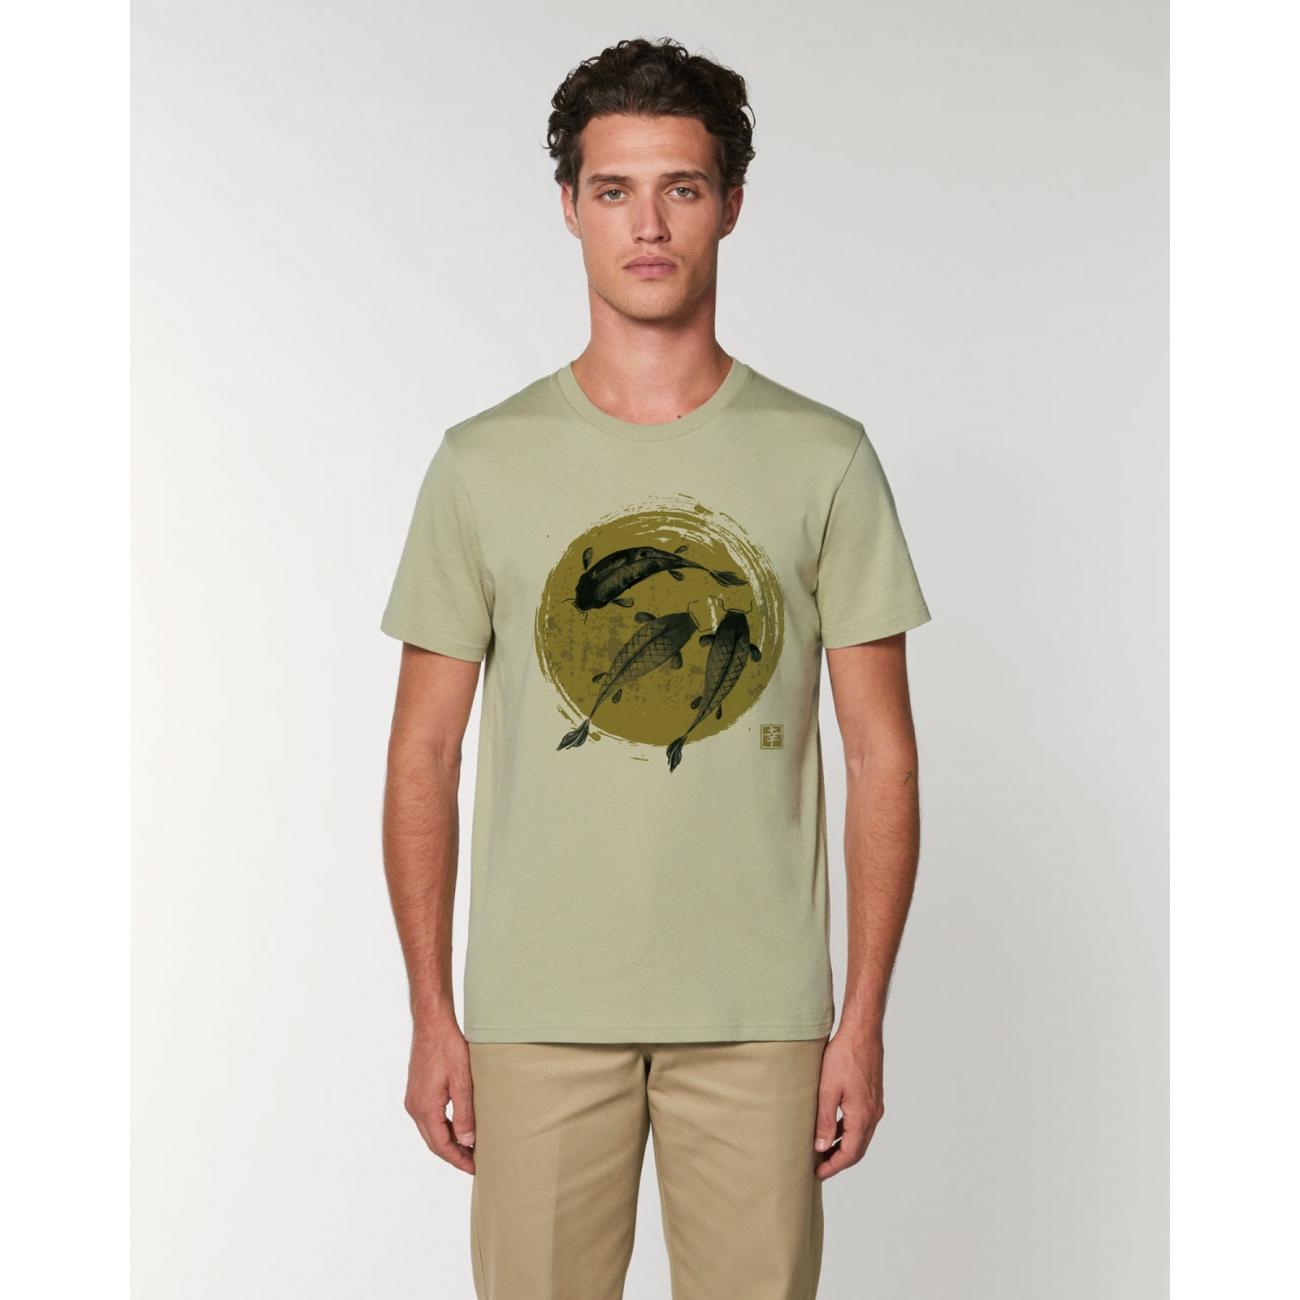 https://tee-shirt-bio.com/10308-thickbox_default/tee-shirt-homme-coton-bio-col-rond-coupe-classique-vert-sauge-impression-poissons.jpg